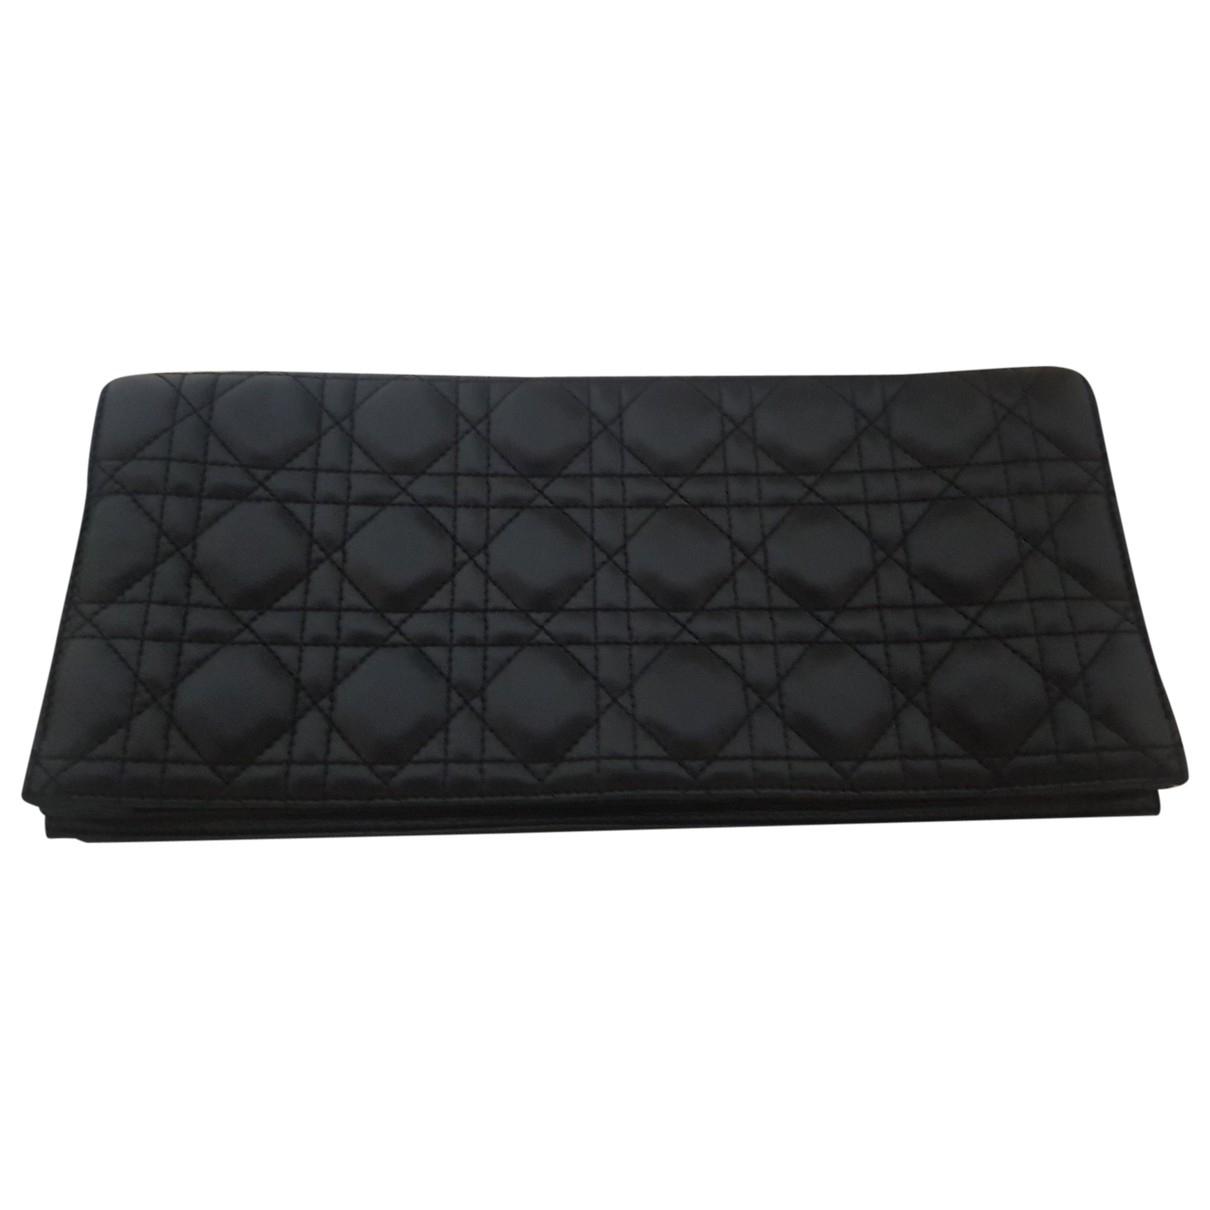 Dior \N Black Leather Clutch bag for Women \N